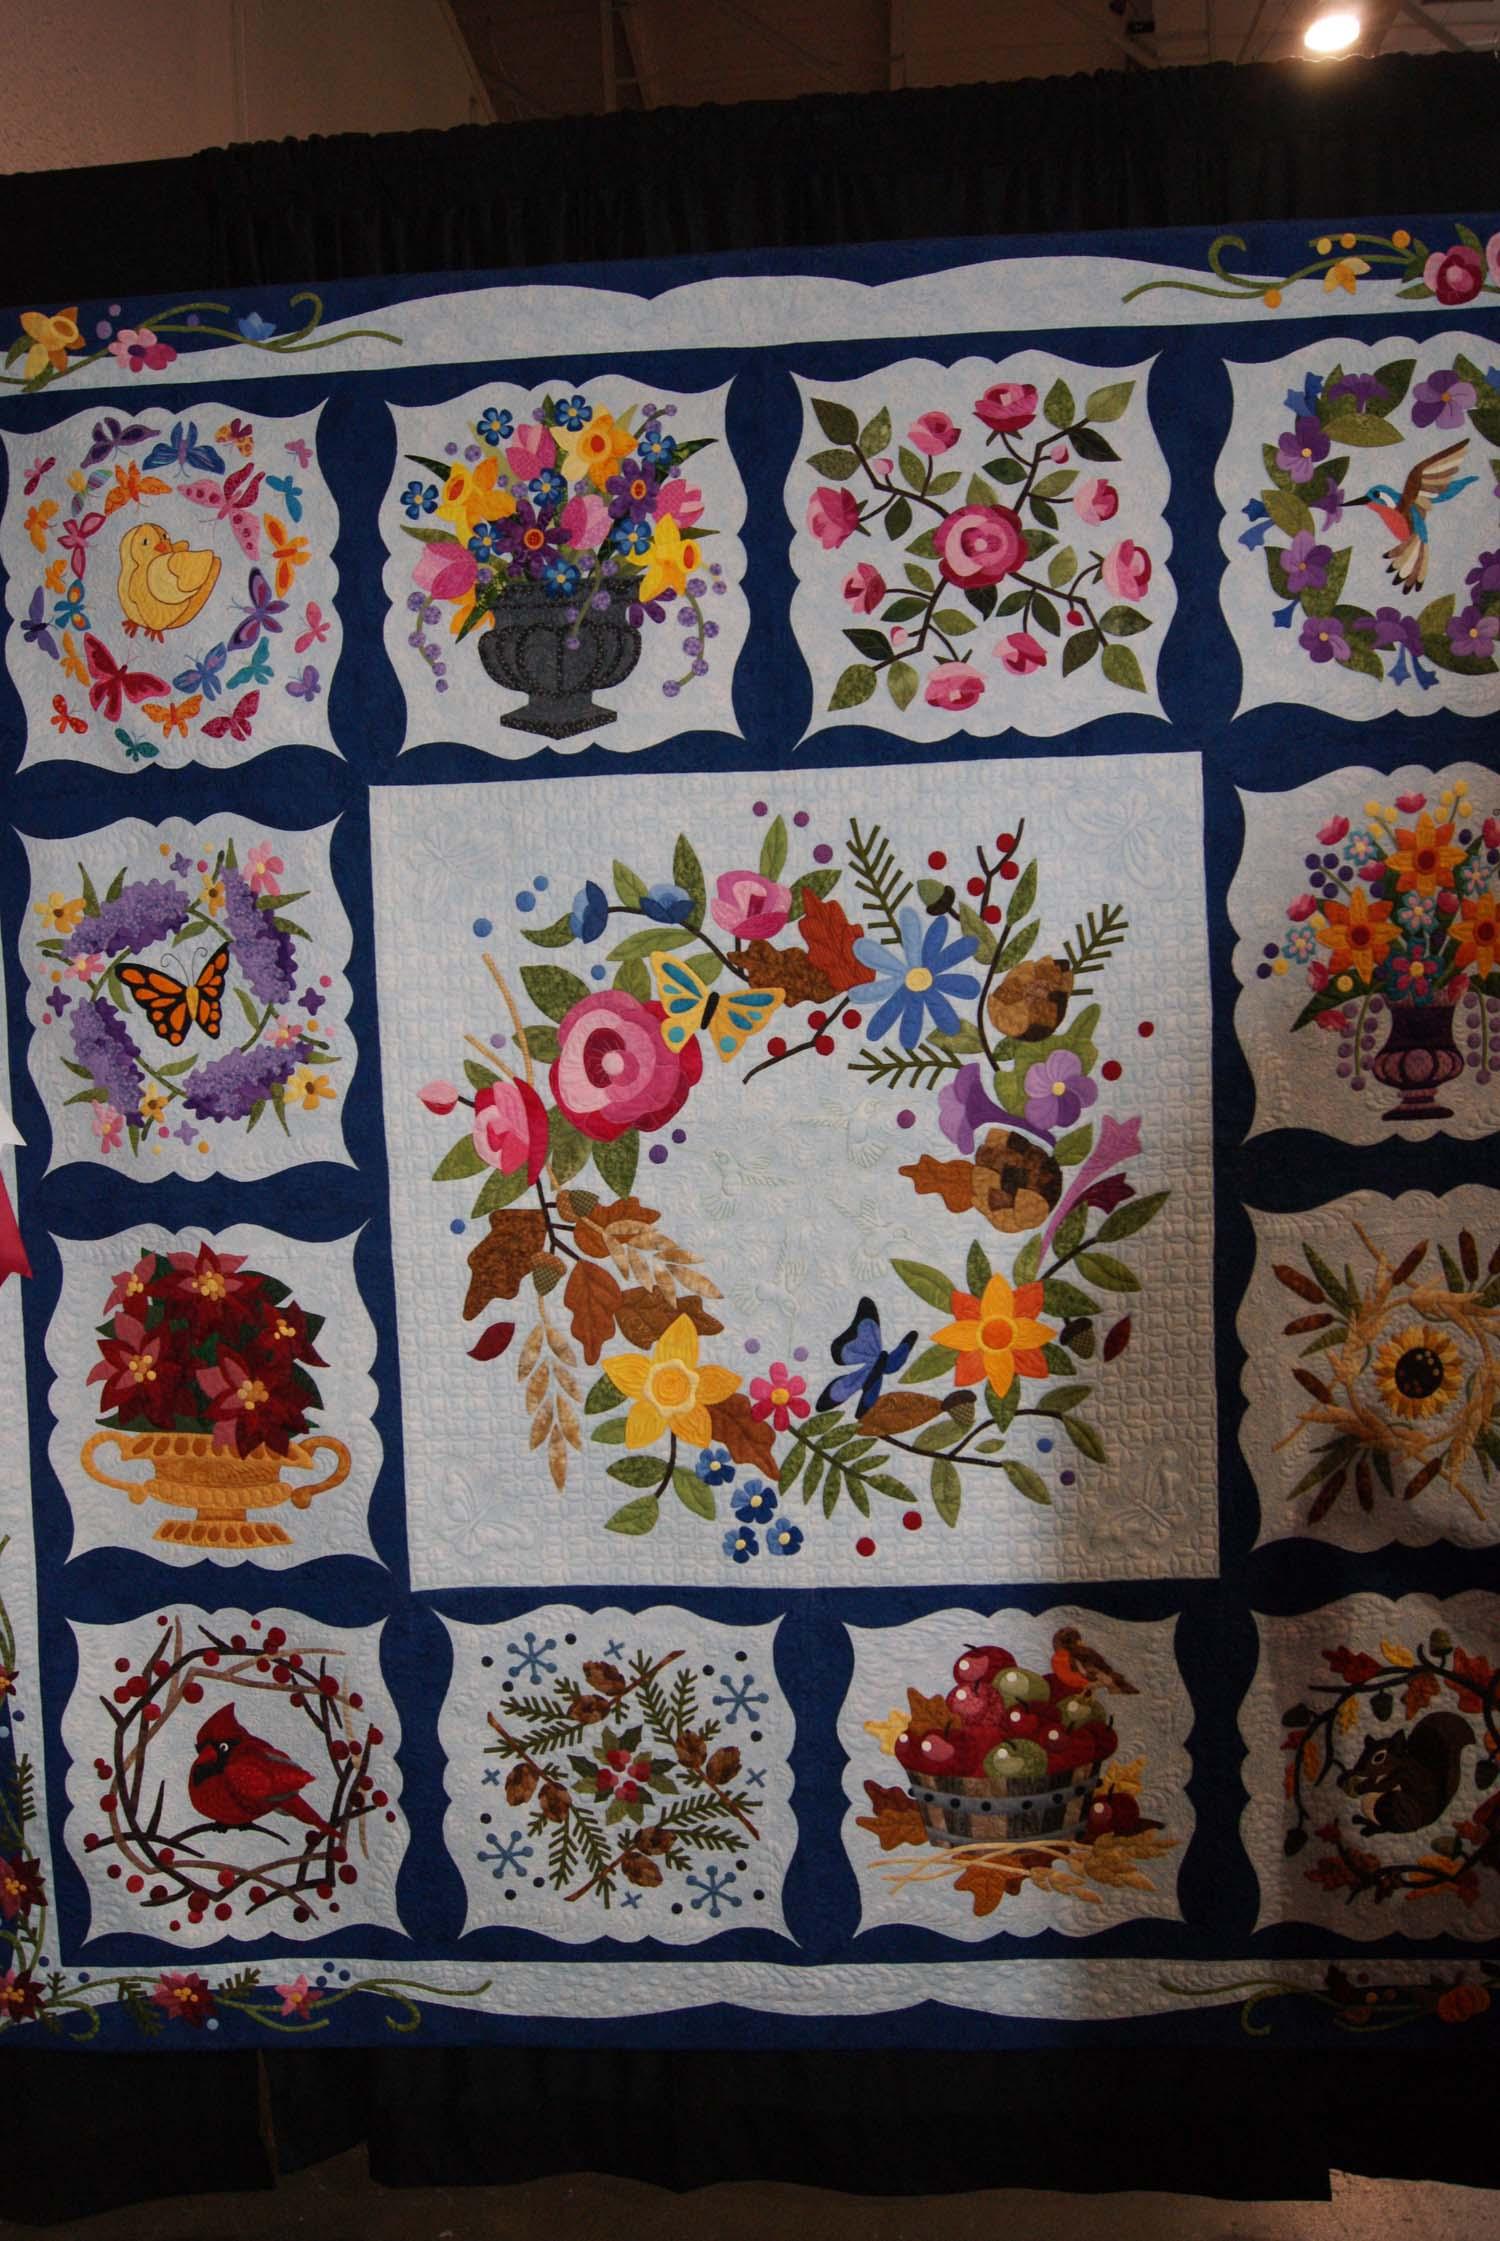 Canadian Quilt Show-Part 2 – Stitching Impressions : canadian quilt - Adamdwight.com